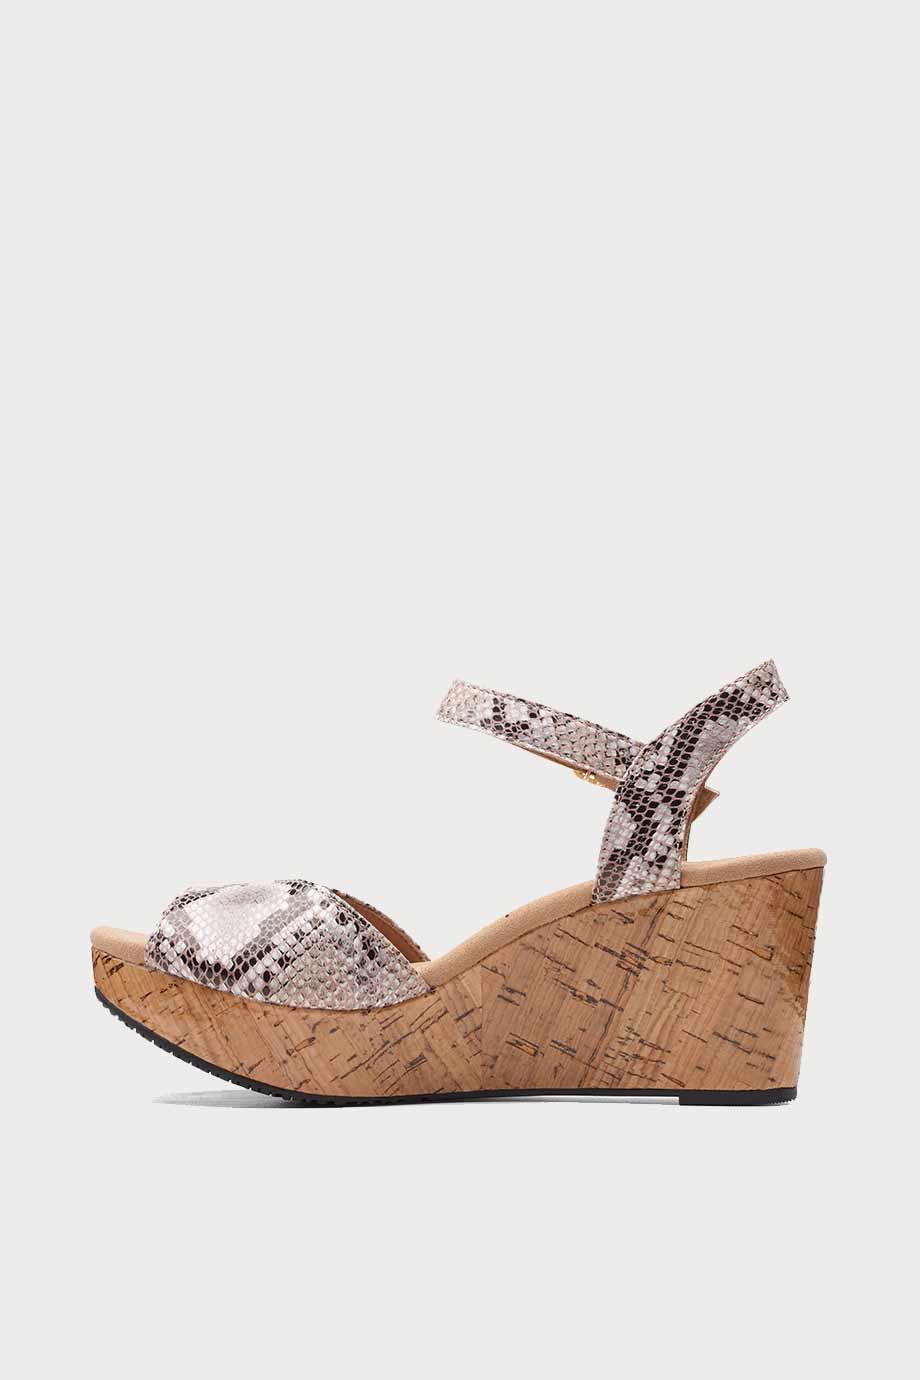 spiridoula metheniti shoes xalkida Annadel Mystic clarks natural snake 5